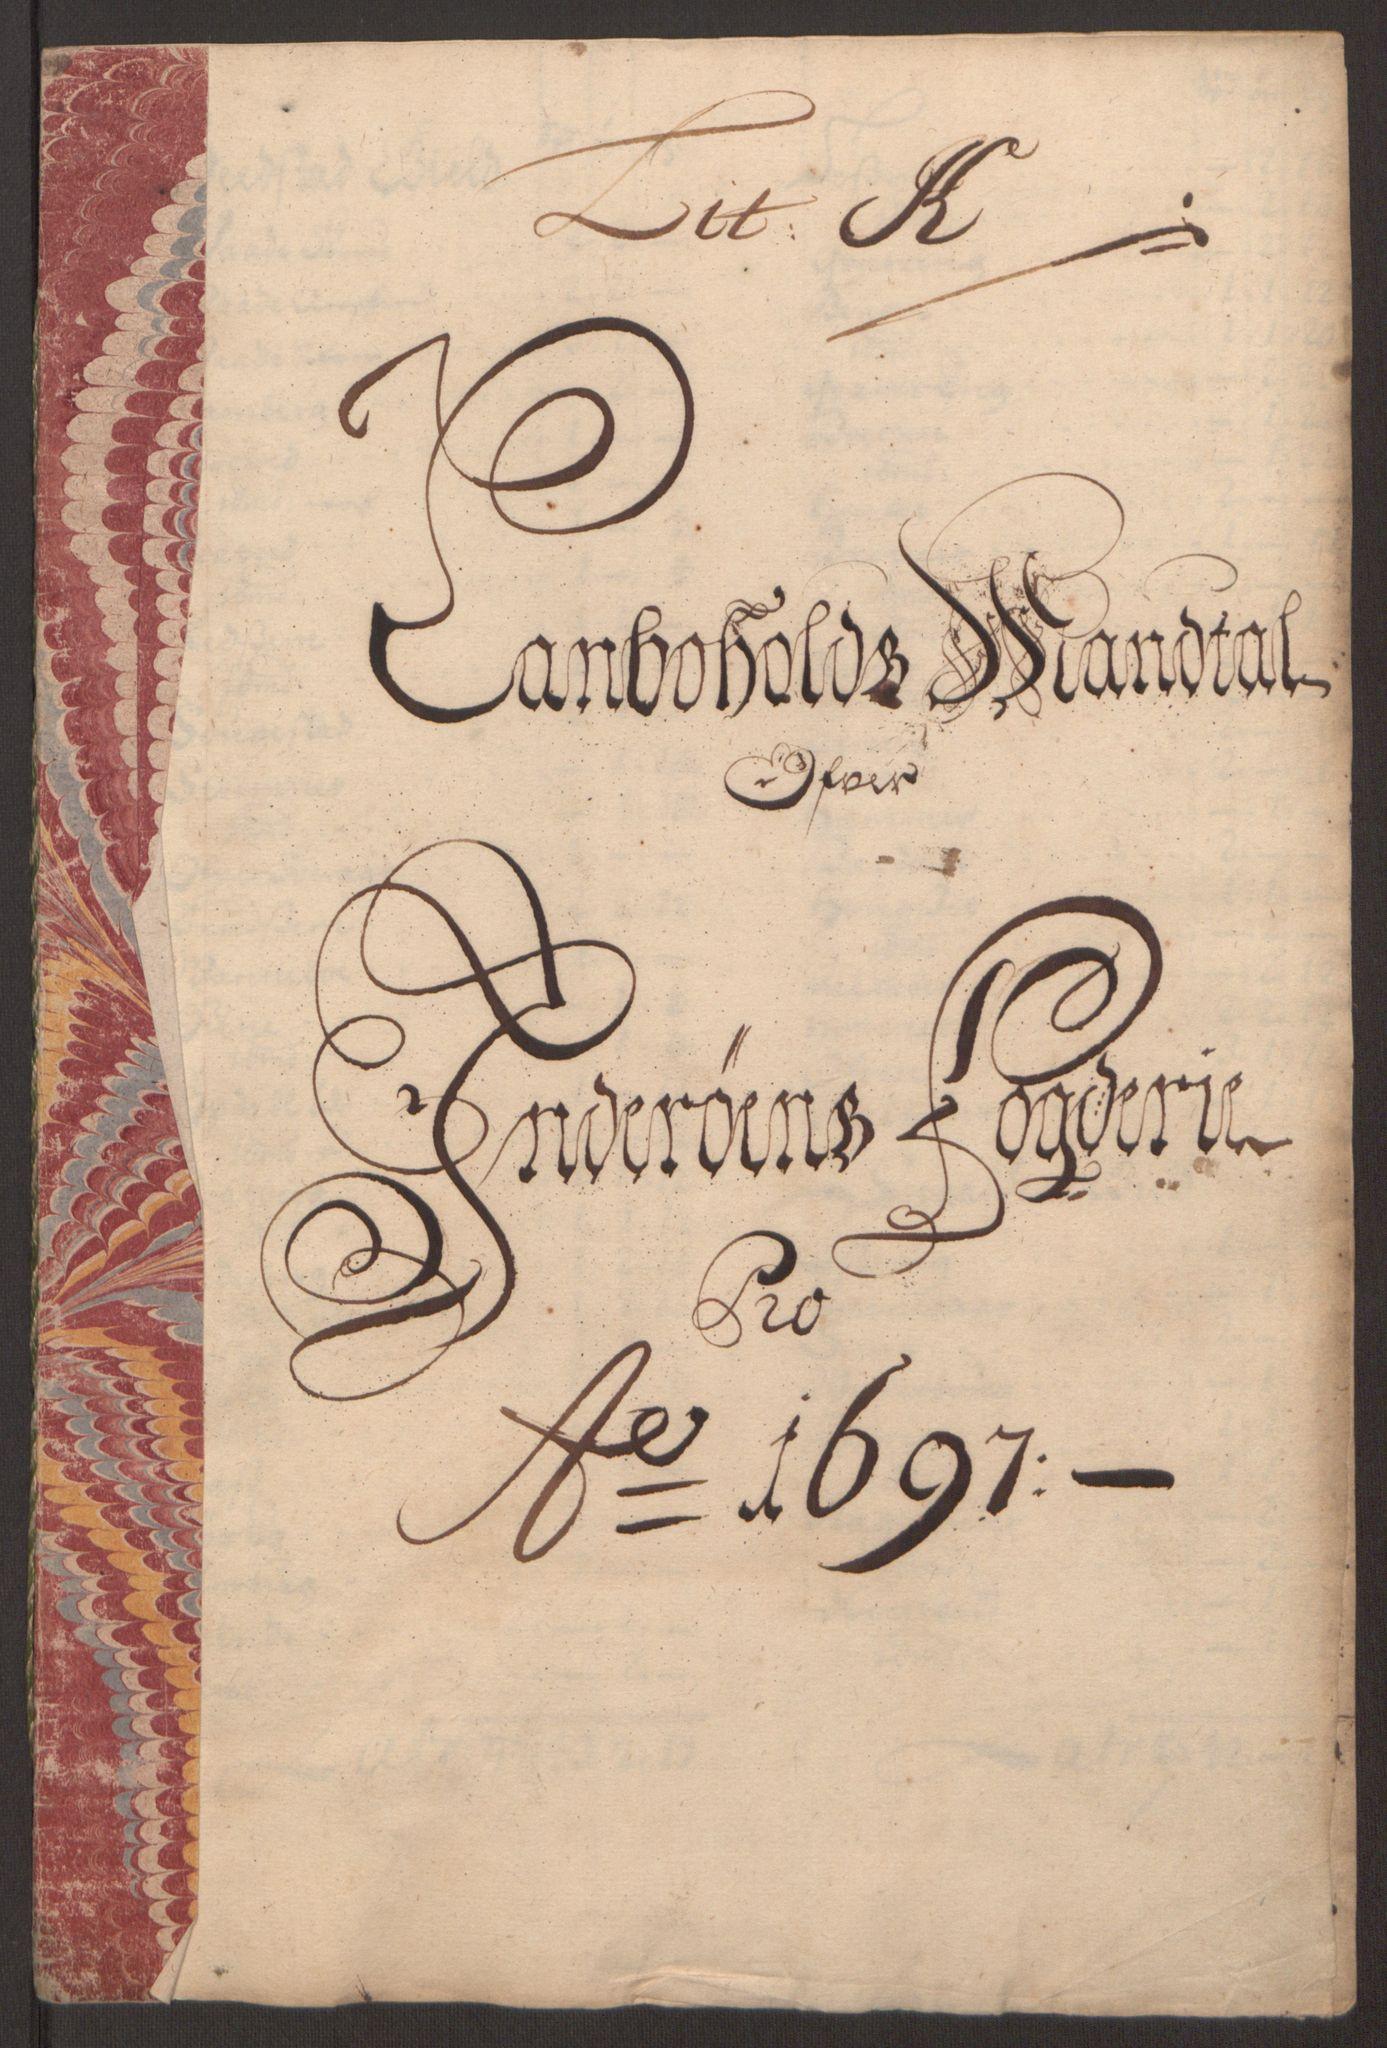 RA, Rentekammeret inntil 1814, Reviderte regnskaper, Fogderegnskap, R63/L4309: Fogderegnskap Inderøy, 1695-1697, s. 487